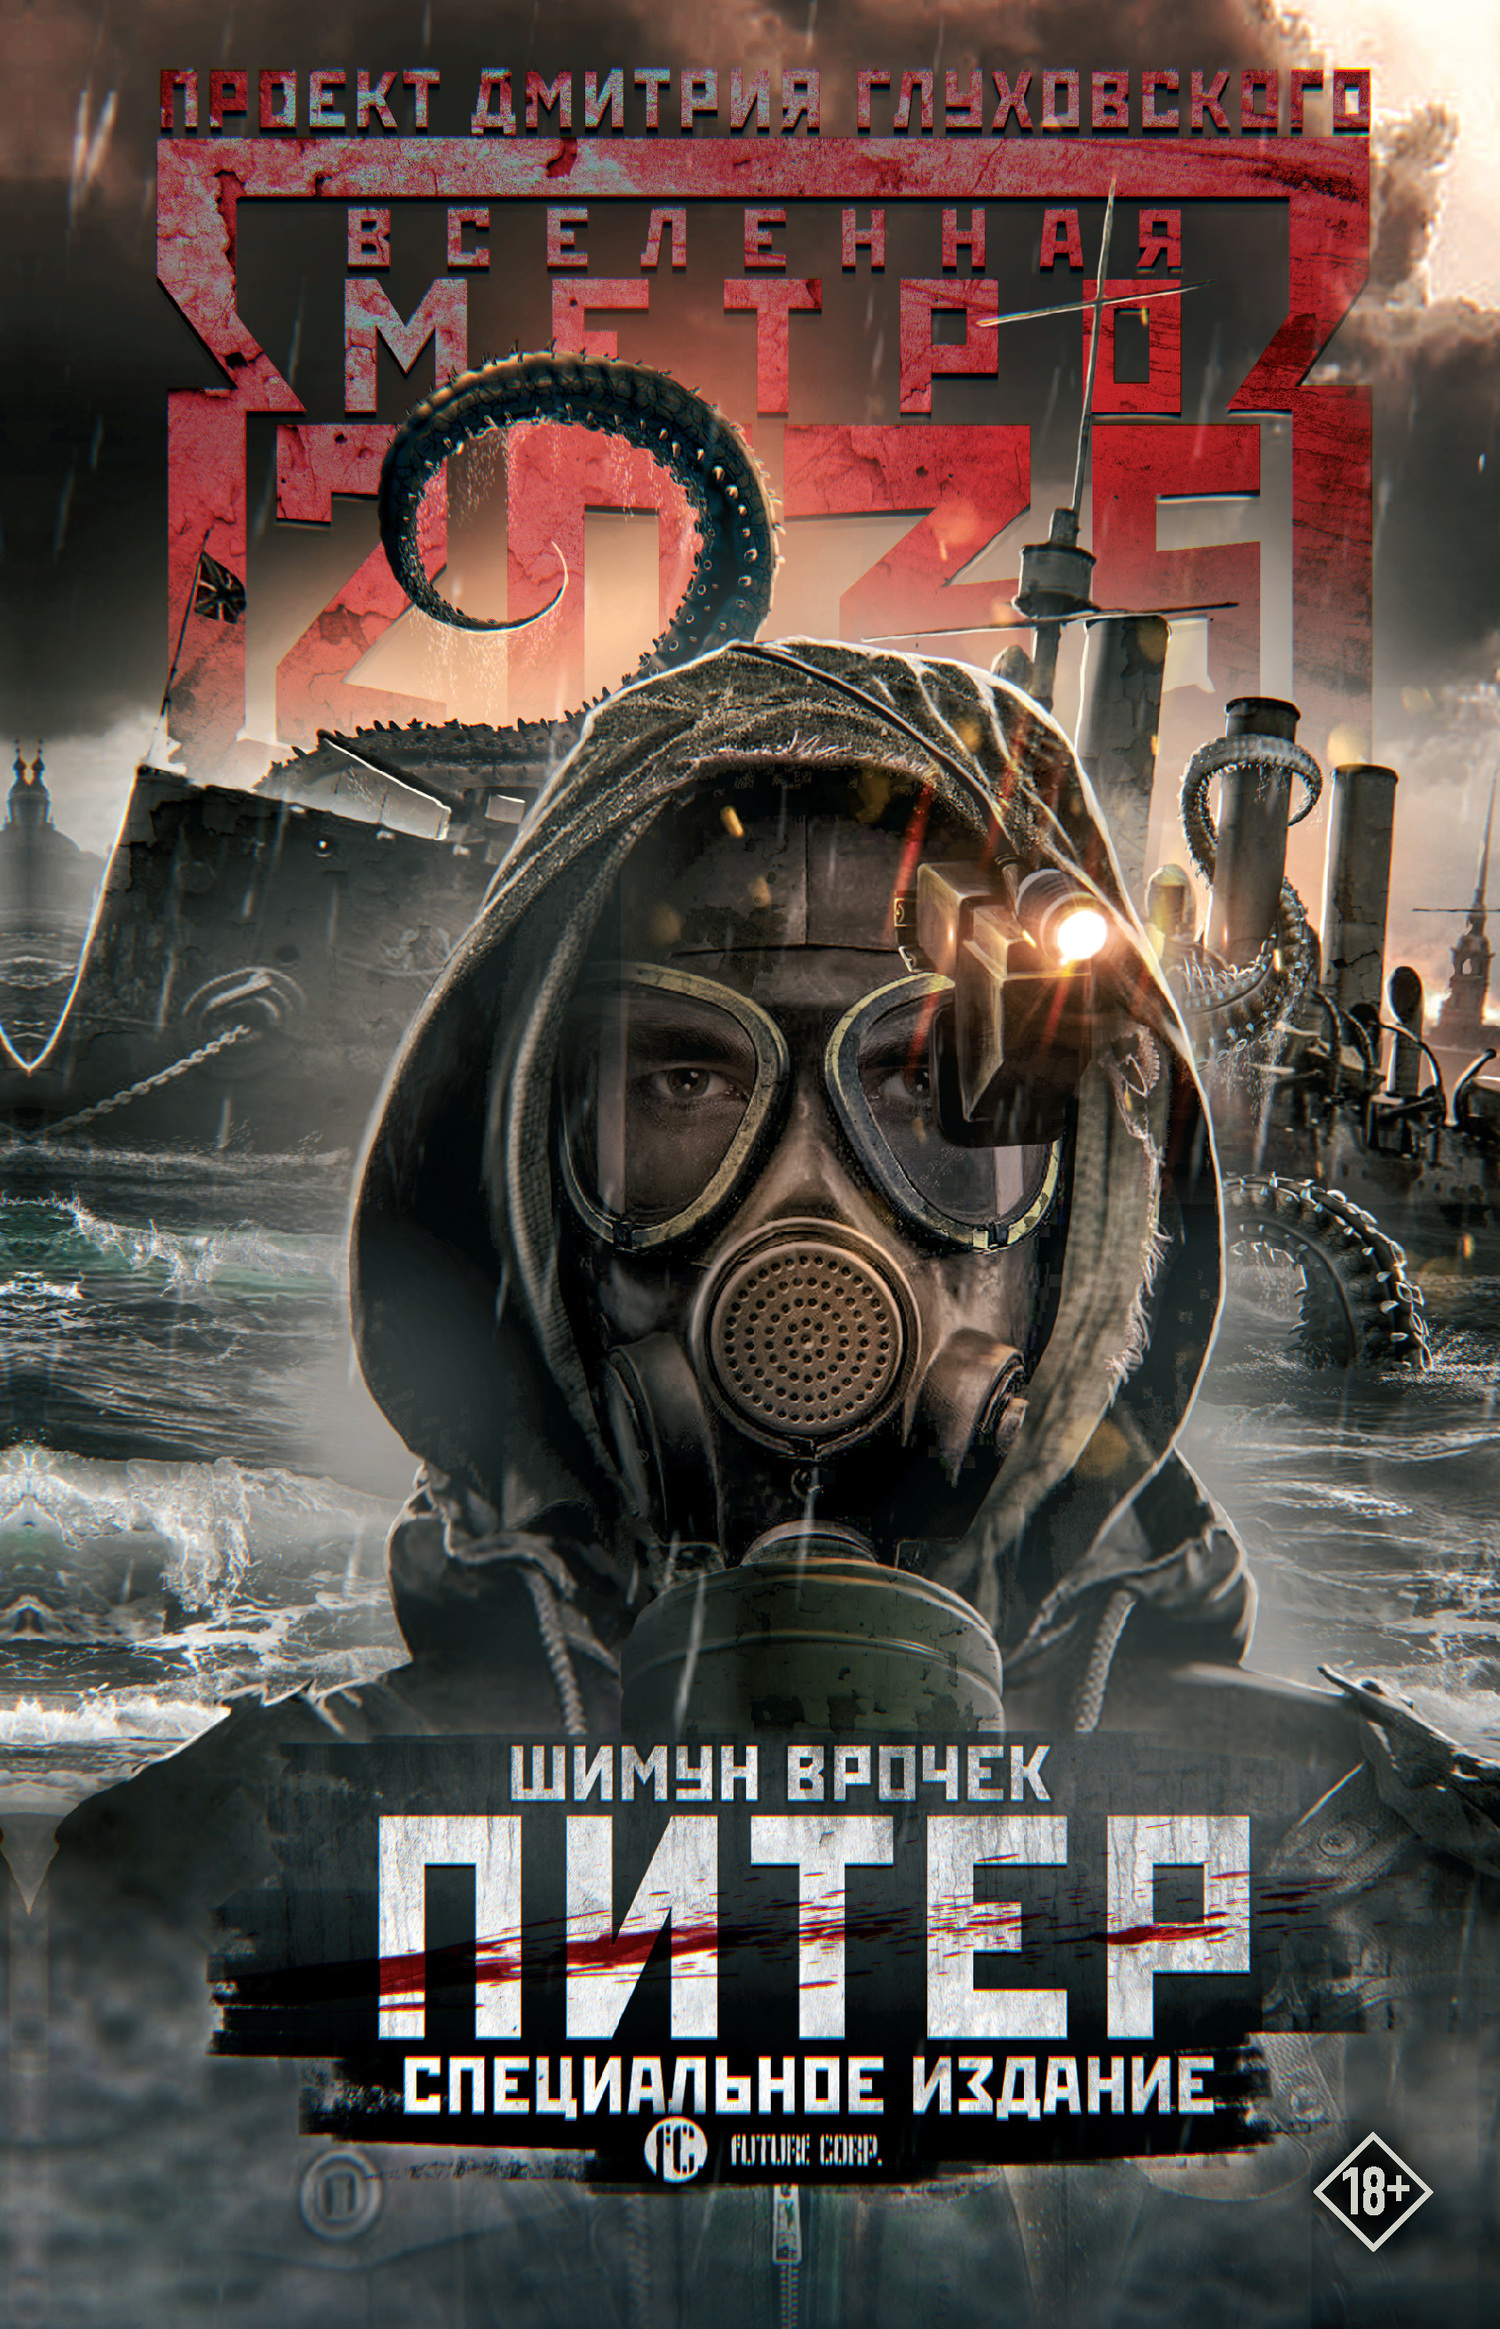 Скачать книгу метро 2033 питер fb2